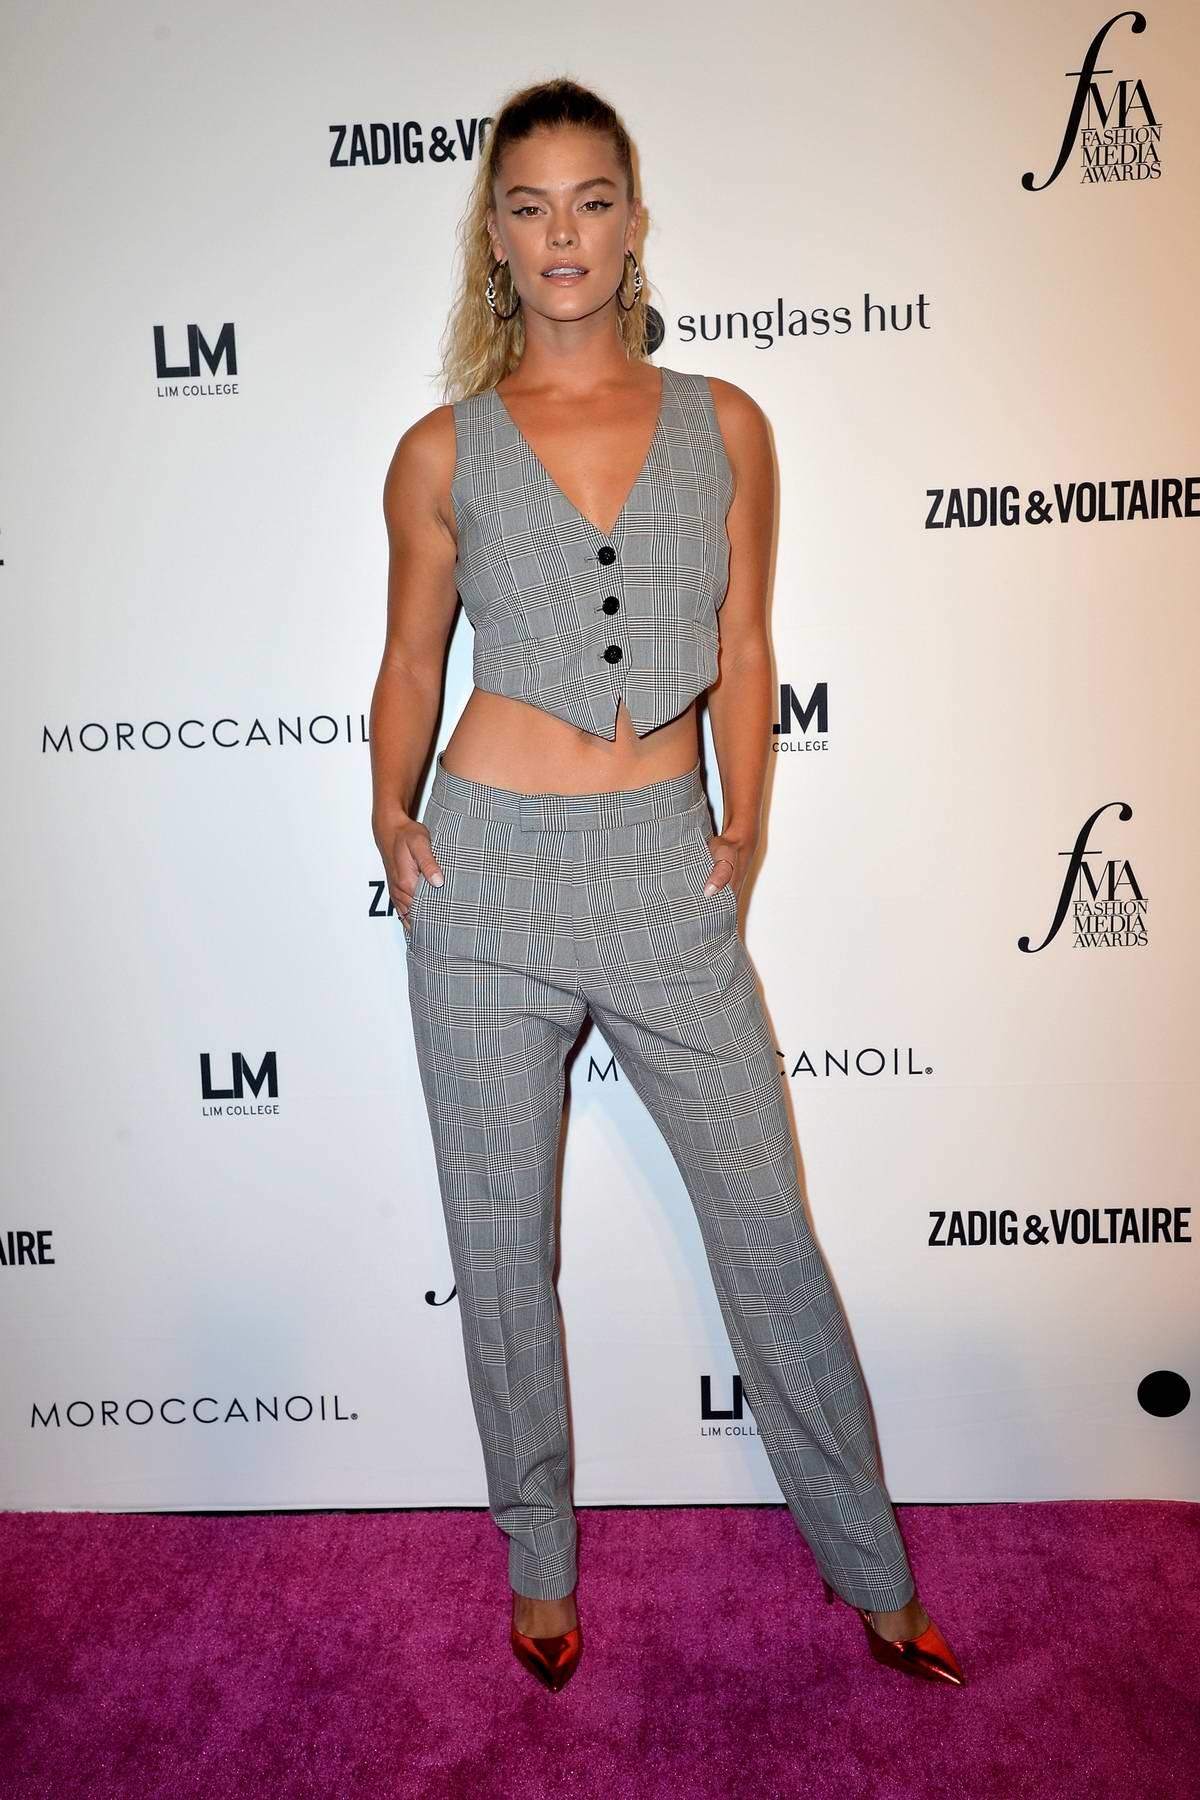 Nina Agdal attends the Daily Front Row's 2018 Fashion Media Awards at Park Hyatt in New York City